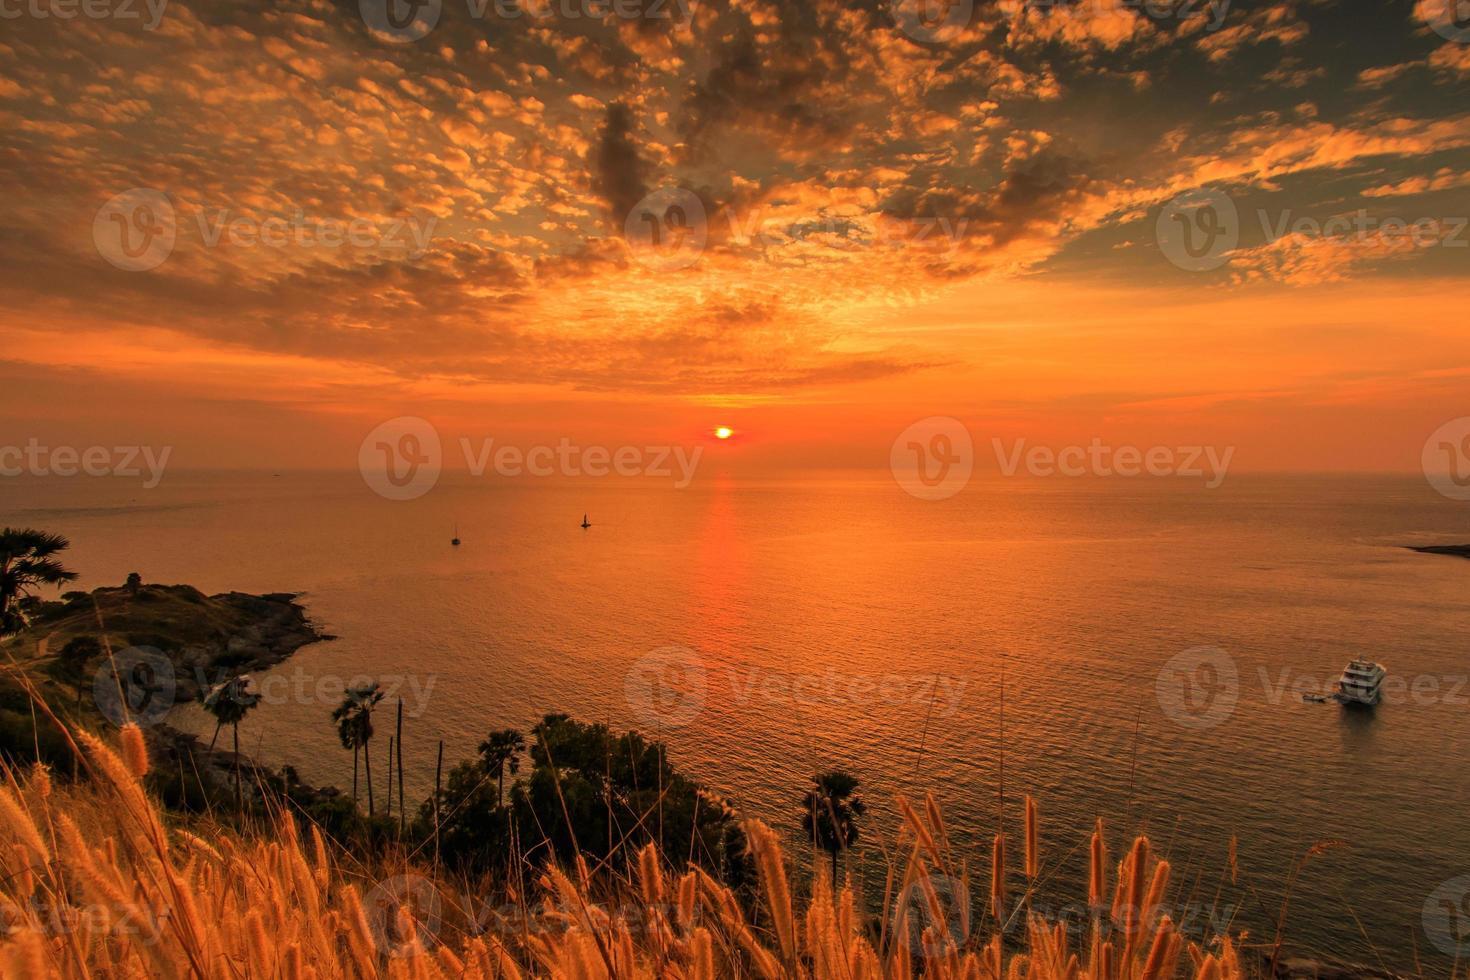 Promthep Kap auf Phuket Island, Thailand foto